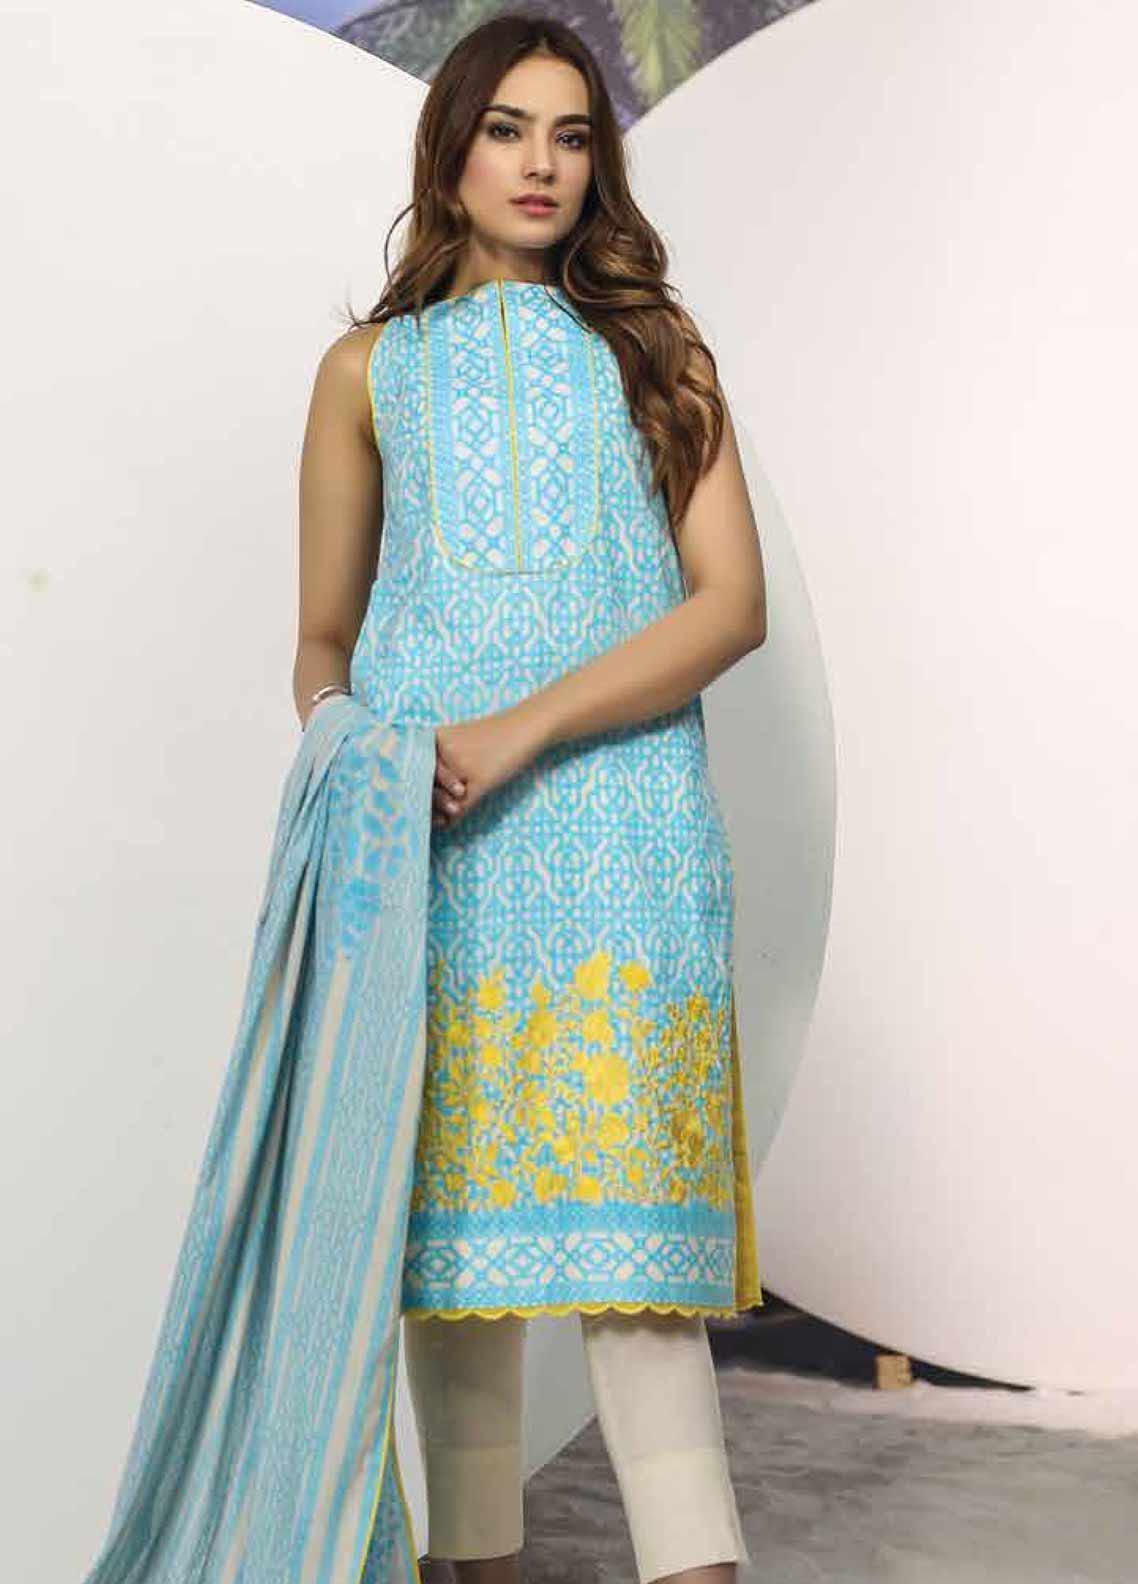 Al Karam Embroidered Lawn Unstitched 2 Piece Suit AK19-L2 12.1 BLUE - Spring / Summer Collection